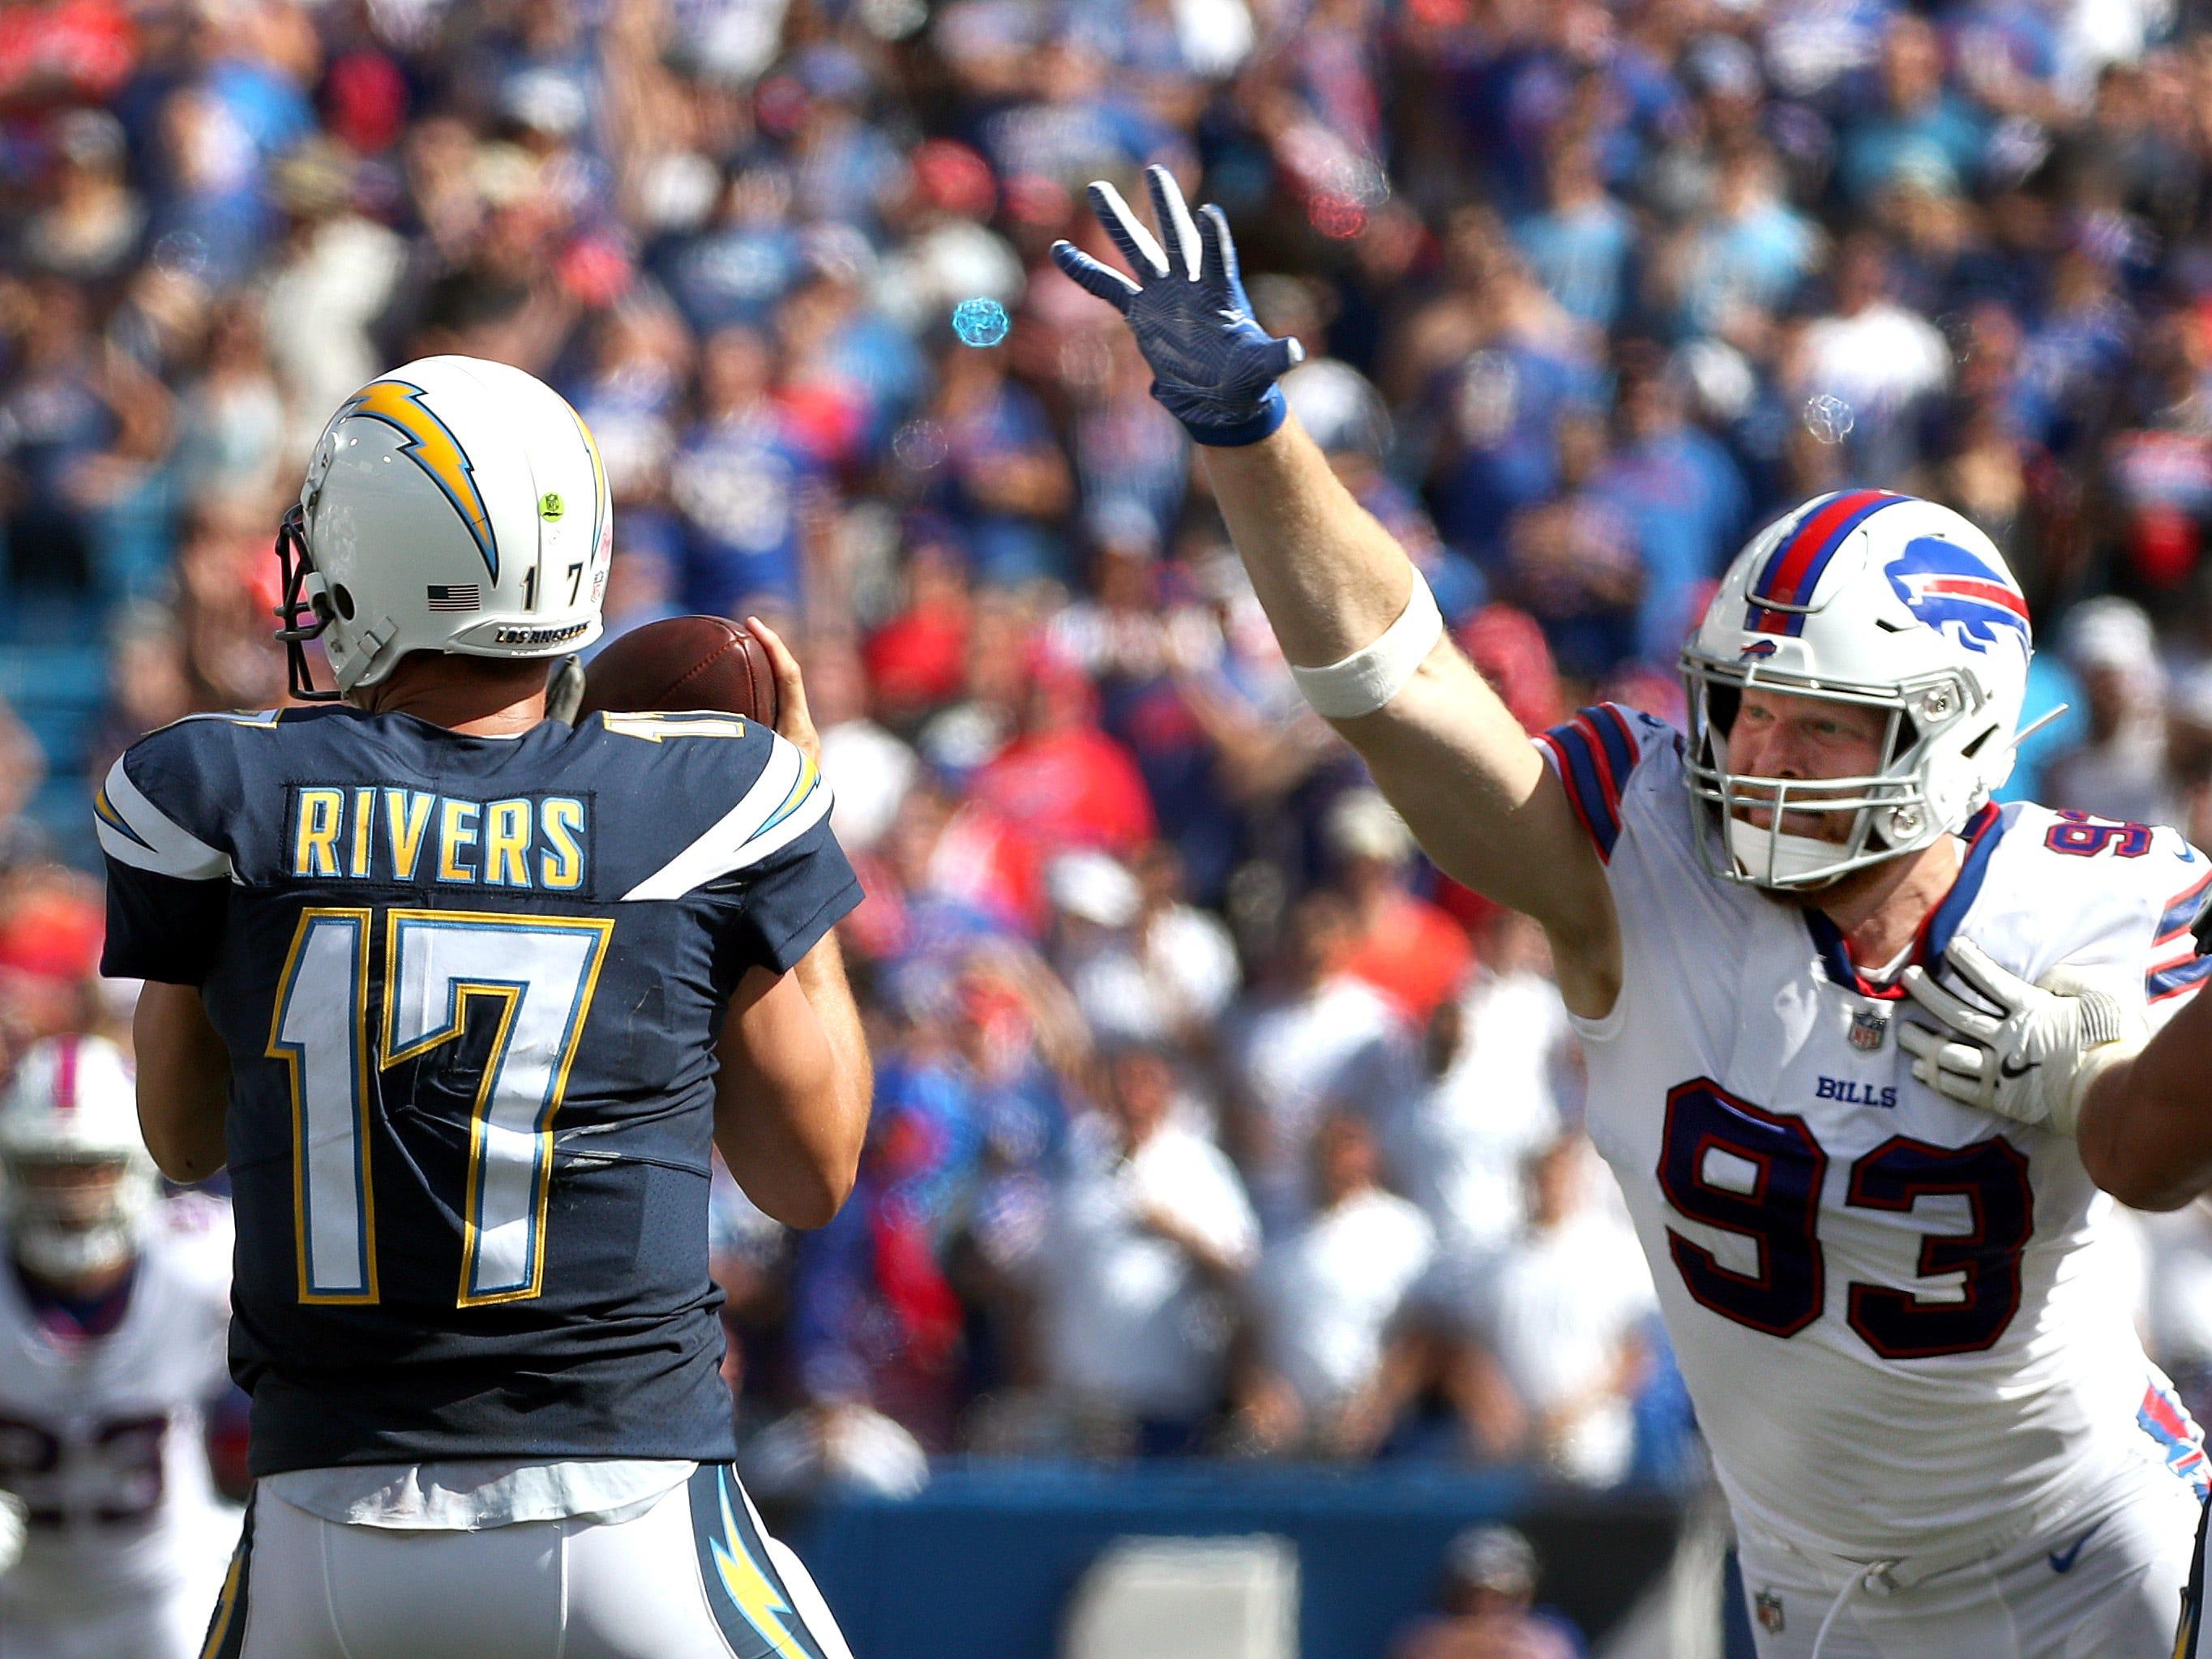 Bills Trent Murphy pressures Chargers quarterback Philip Rivers.